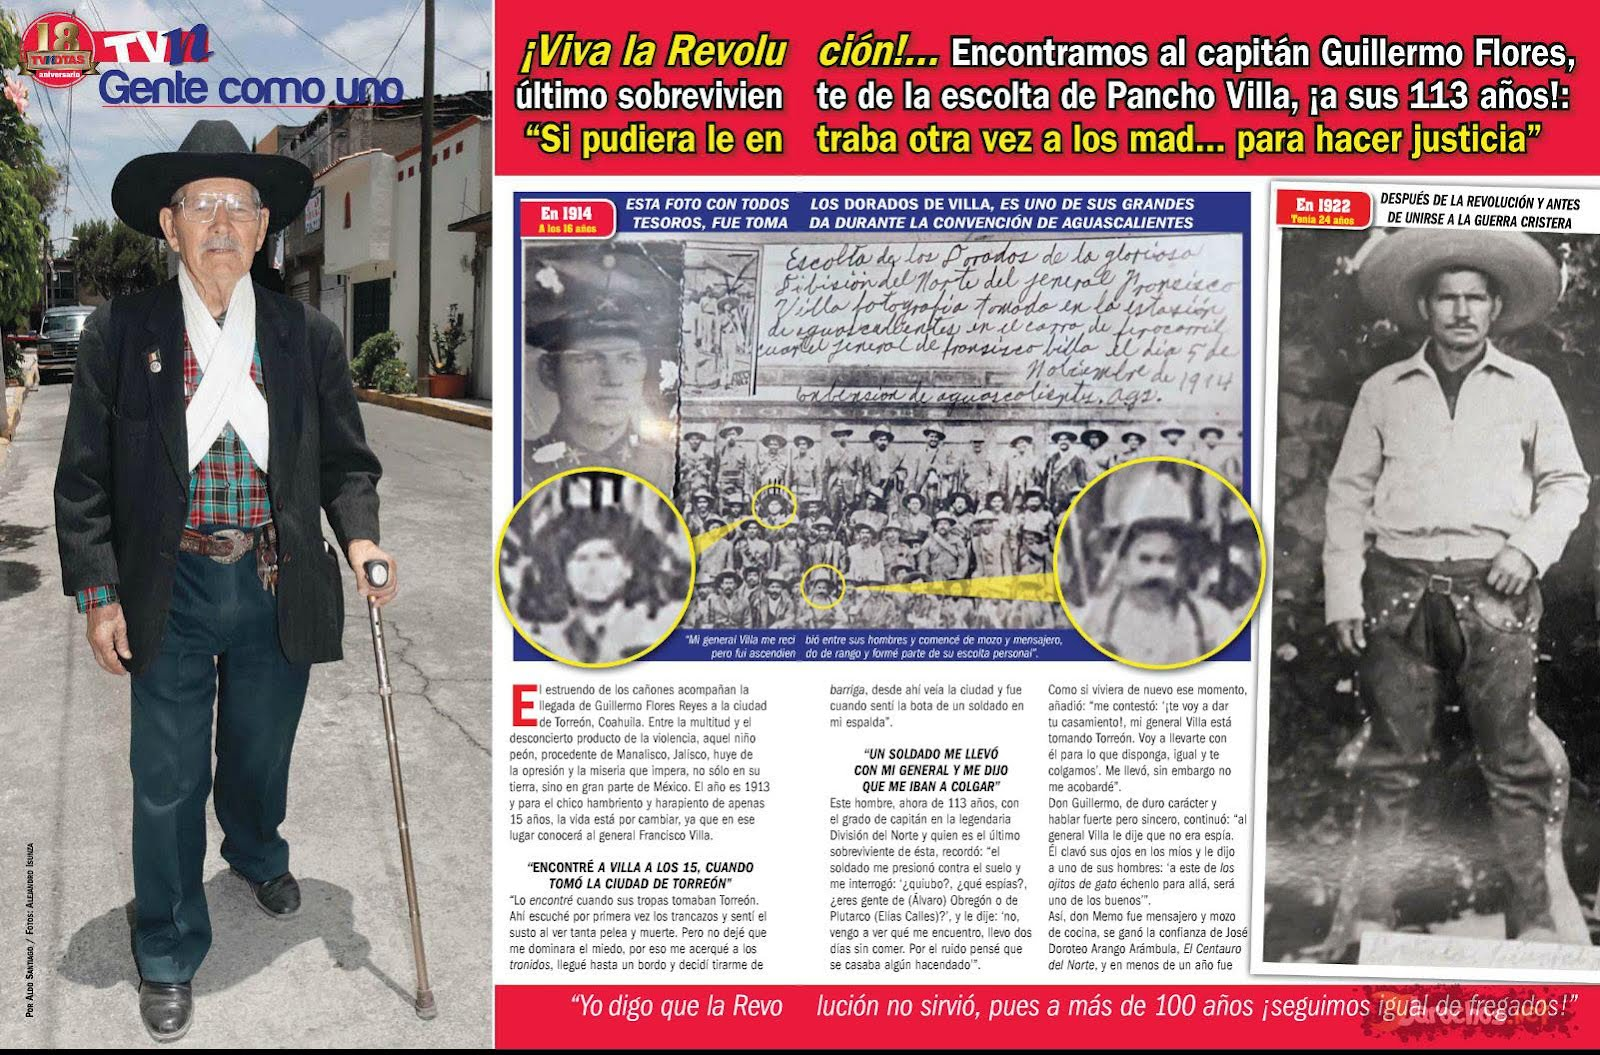 http://3.bp.blogspot.com/-gFIuY3hO_yc/T-EpkcYmePI/AAAAAAAAMlo/JXNS49IqF-o/s1600/Guillermo%2BFlores%2B11.JPG